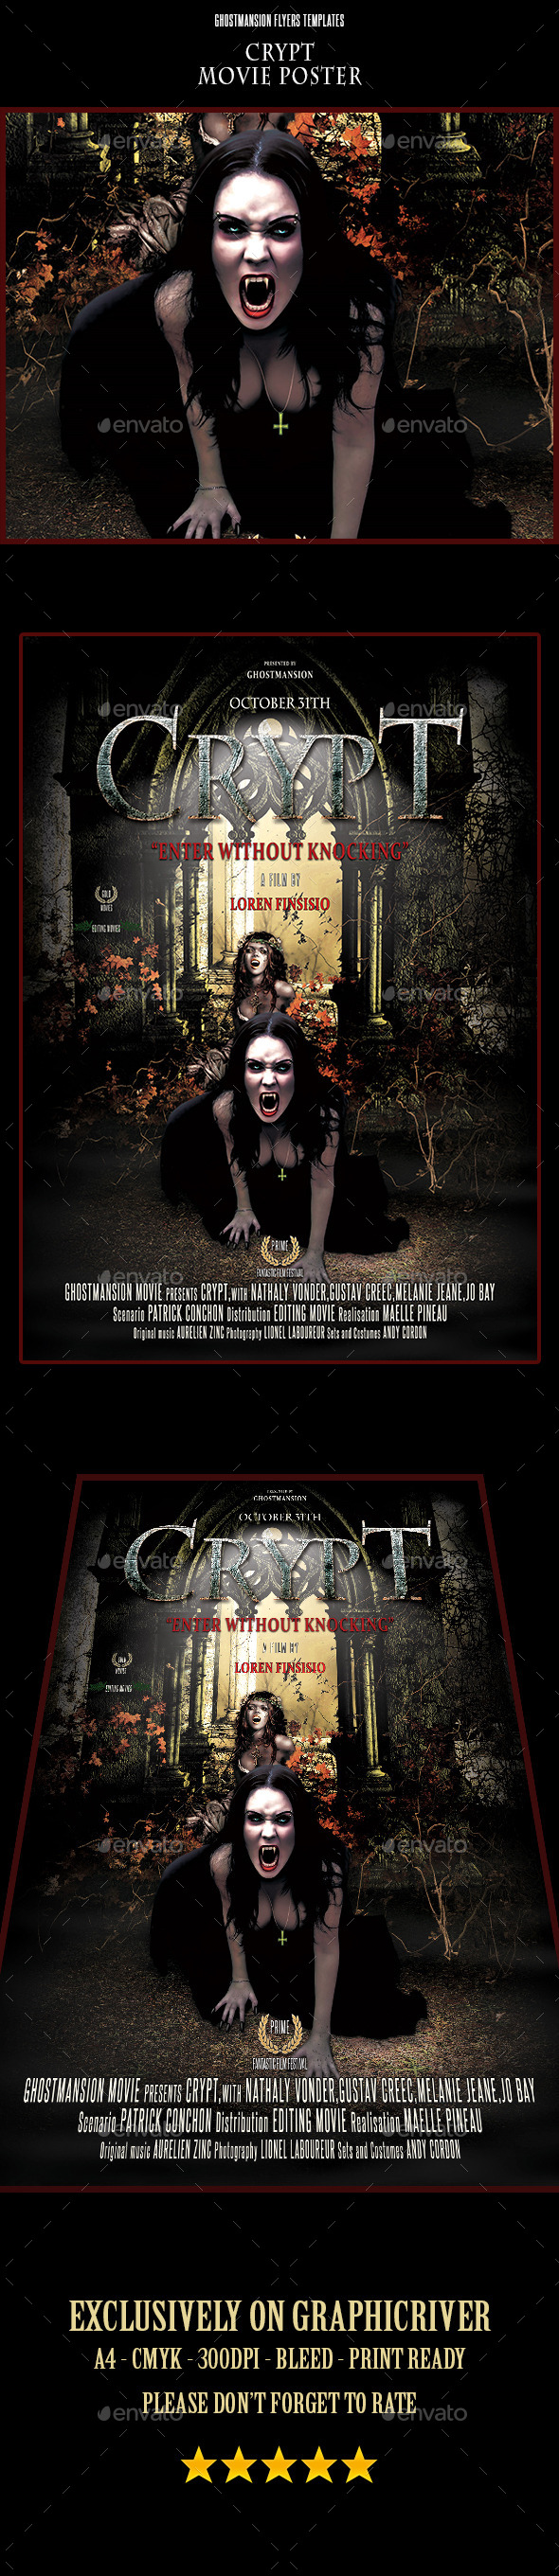 GraphicRiver Crypt Movie Poster 8876334